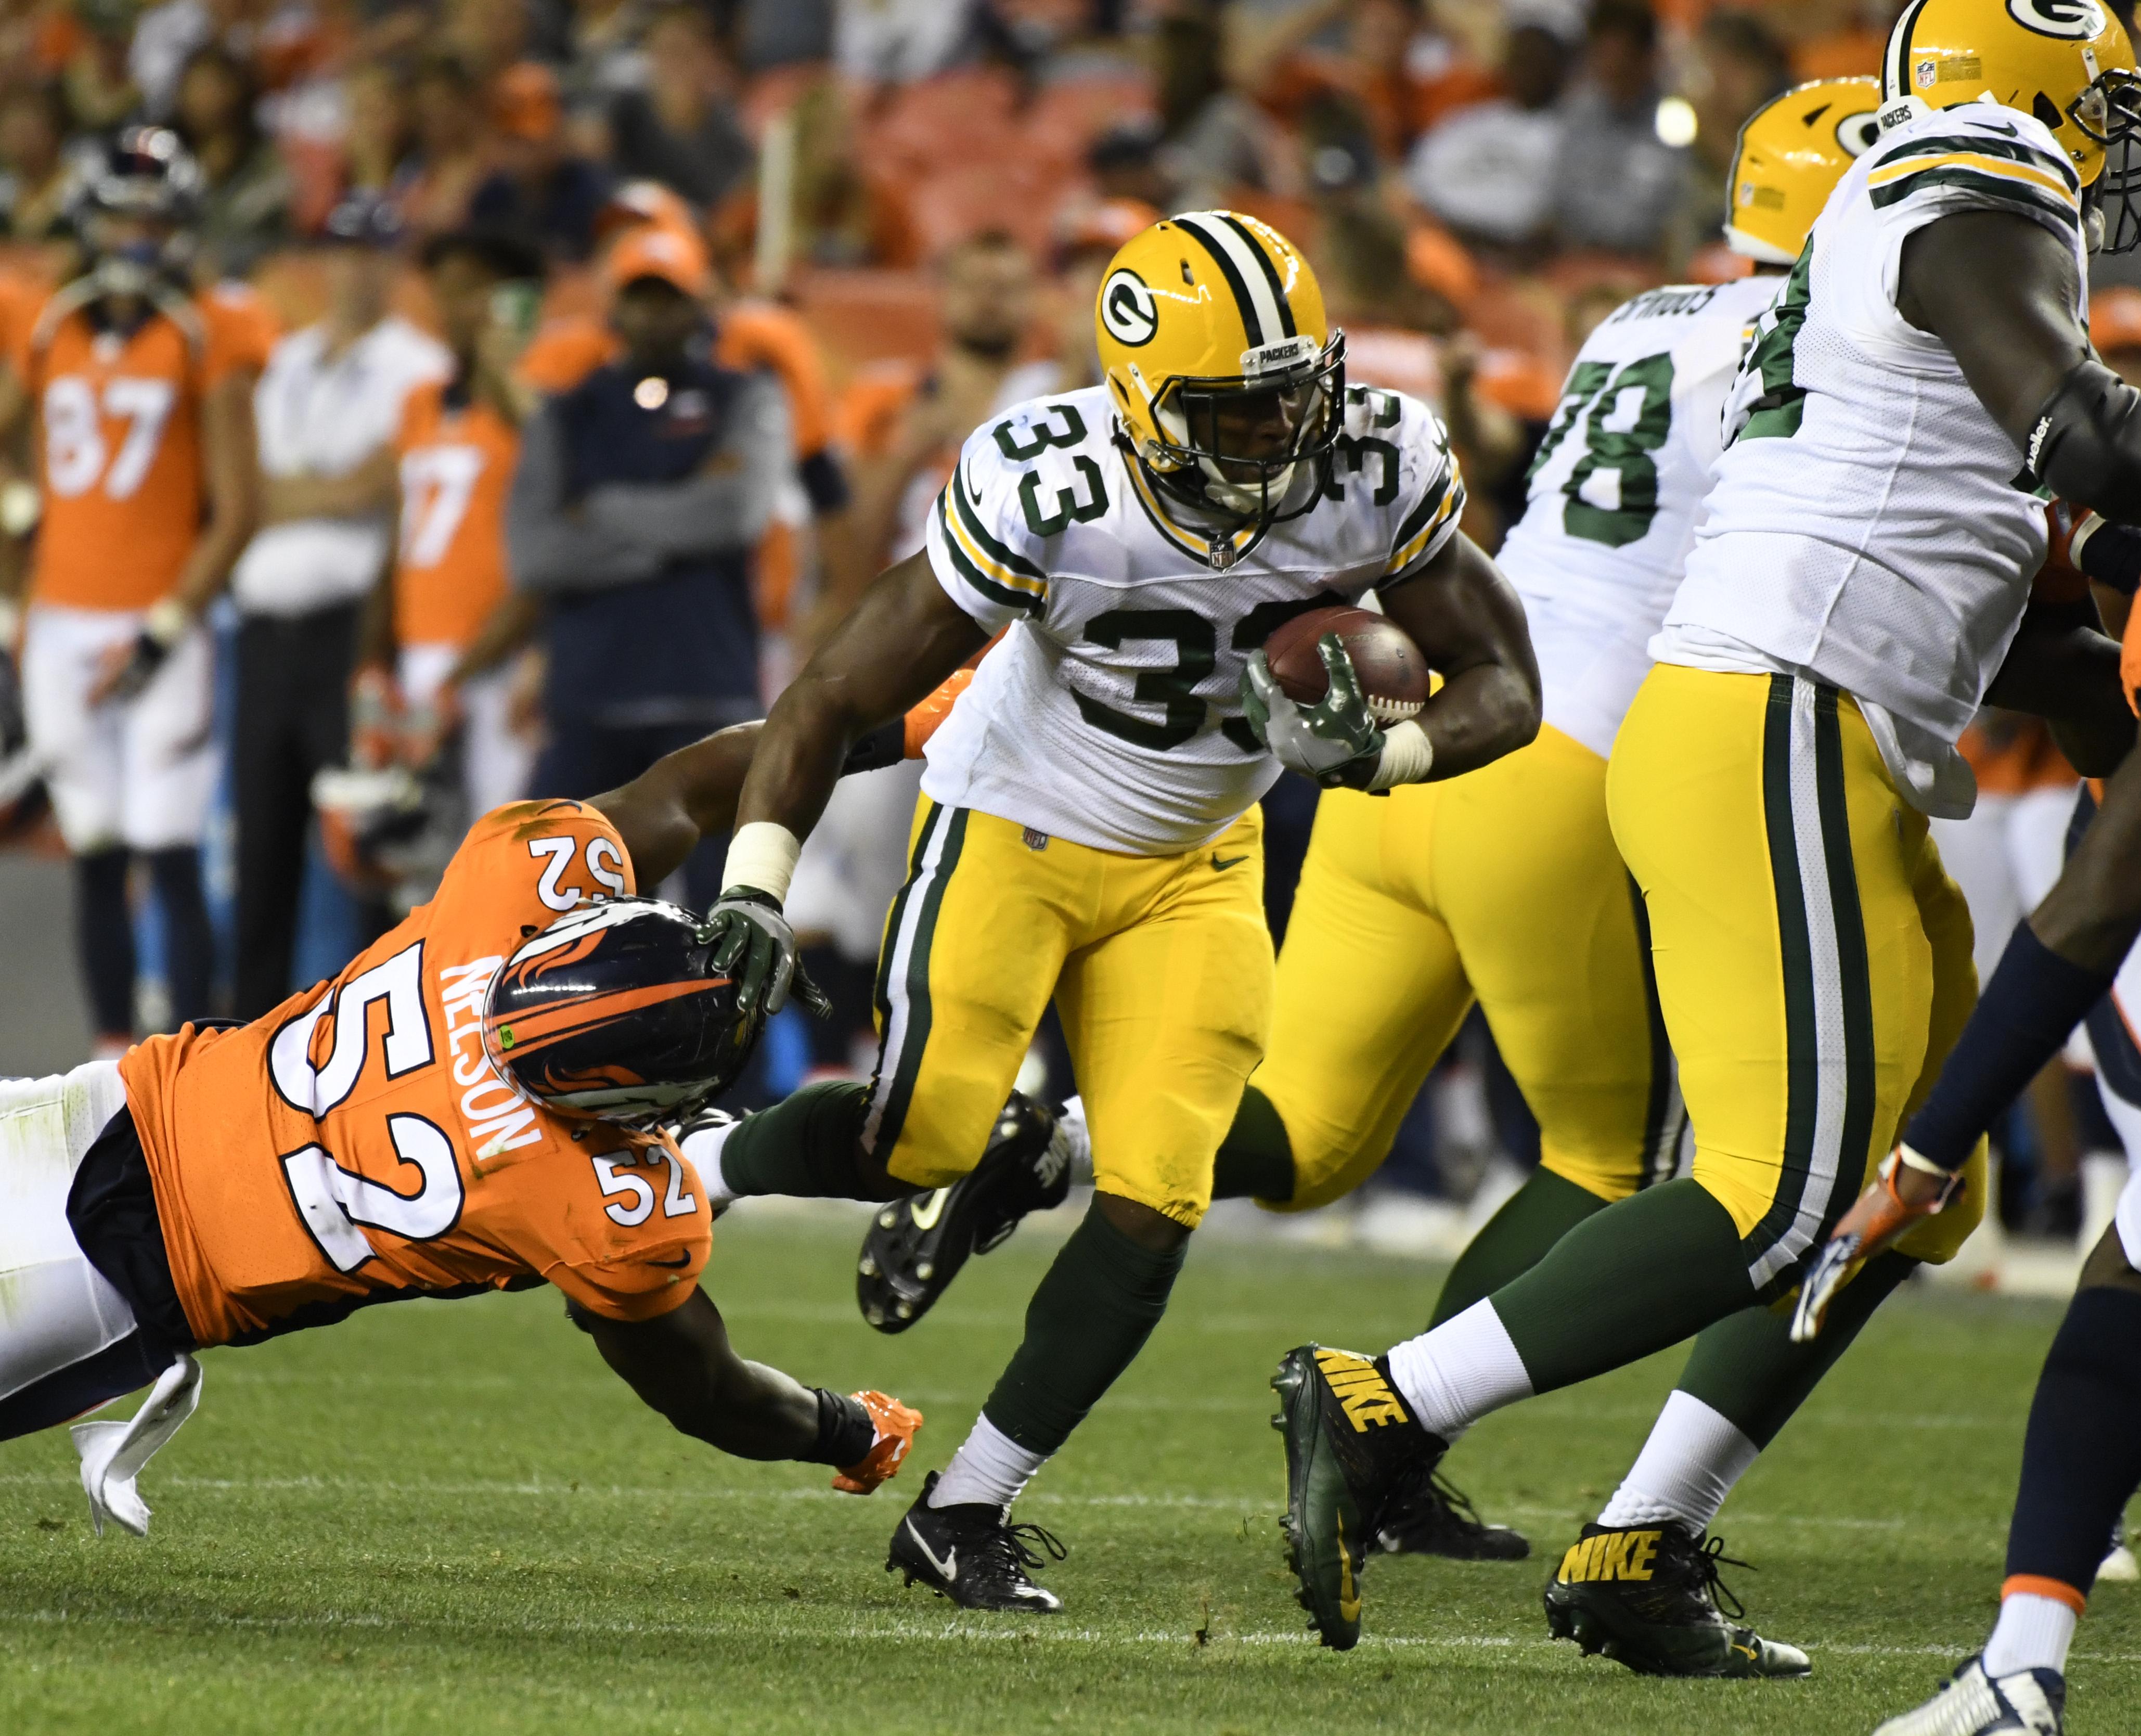 Denver Broncos versus the Green Bay Packers